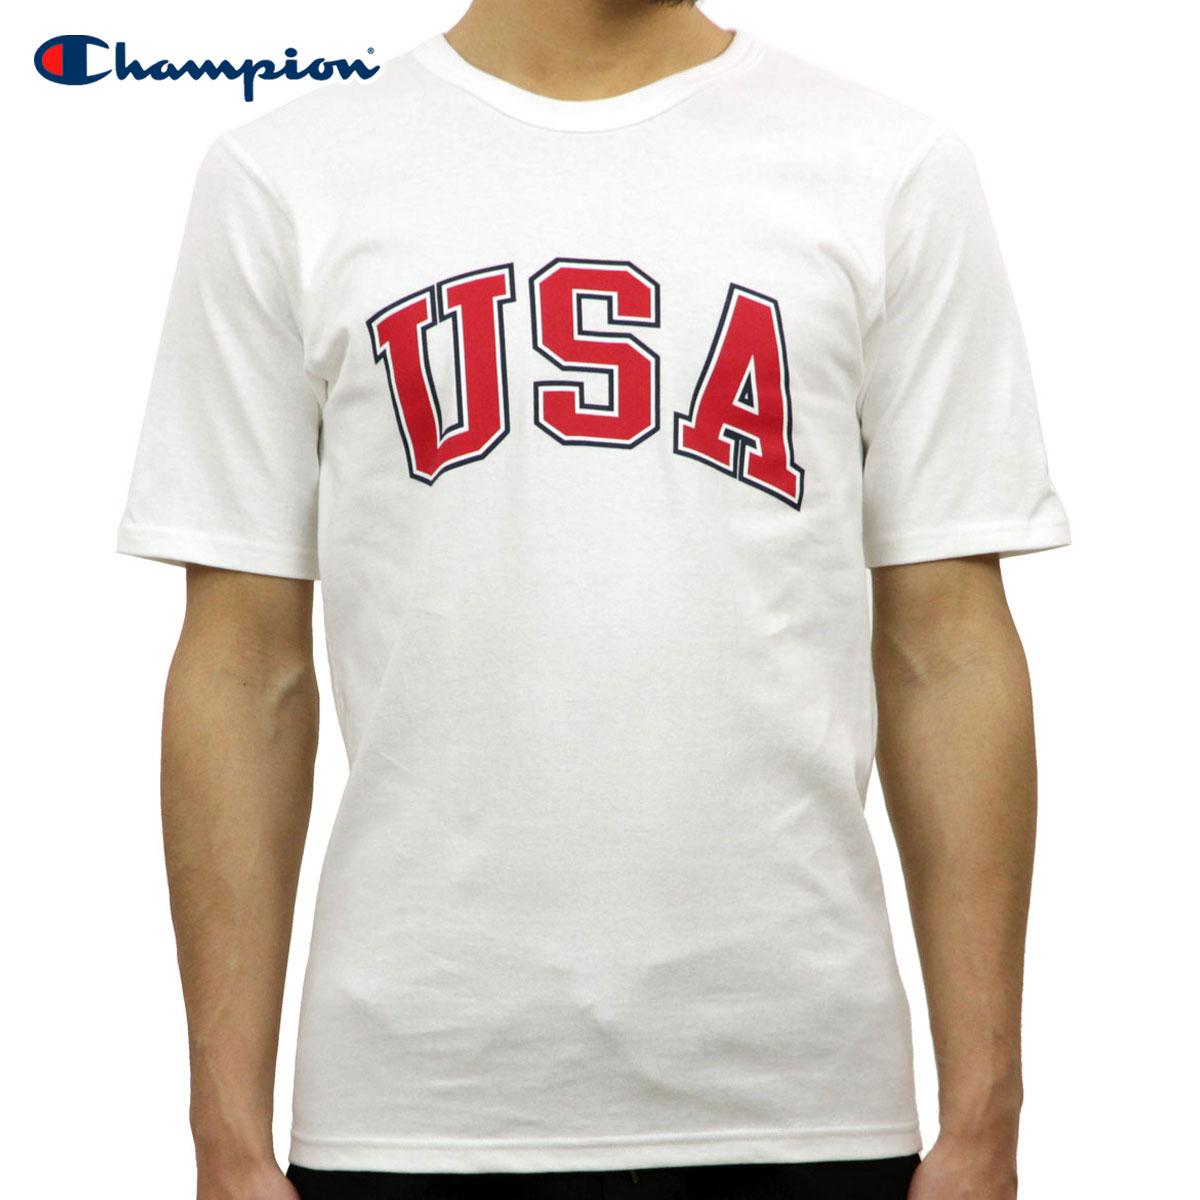 79274de82 Champion CHAMPION regular article men short sleeves T-shirt CREW TEE T1919P  Heritage Tee 045 ...